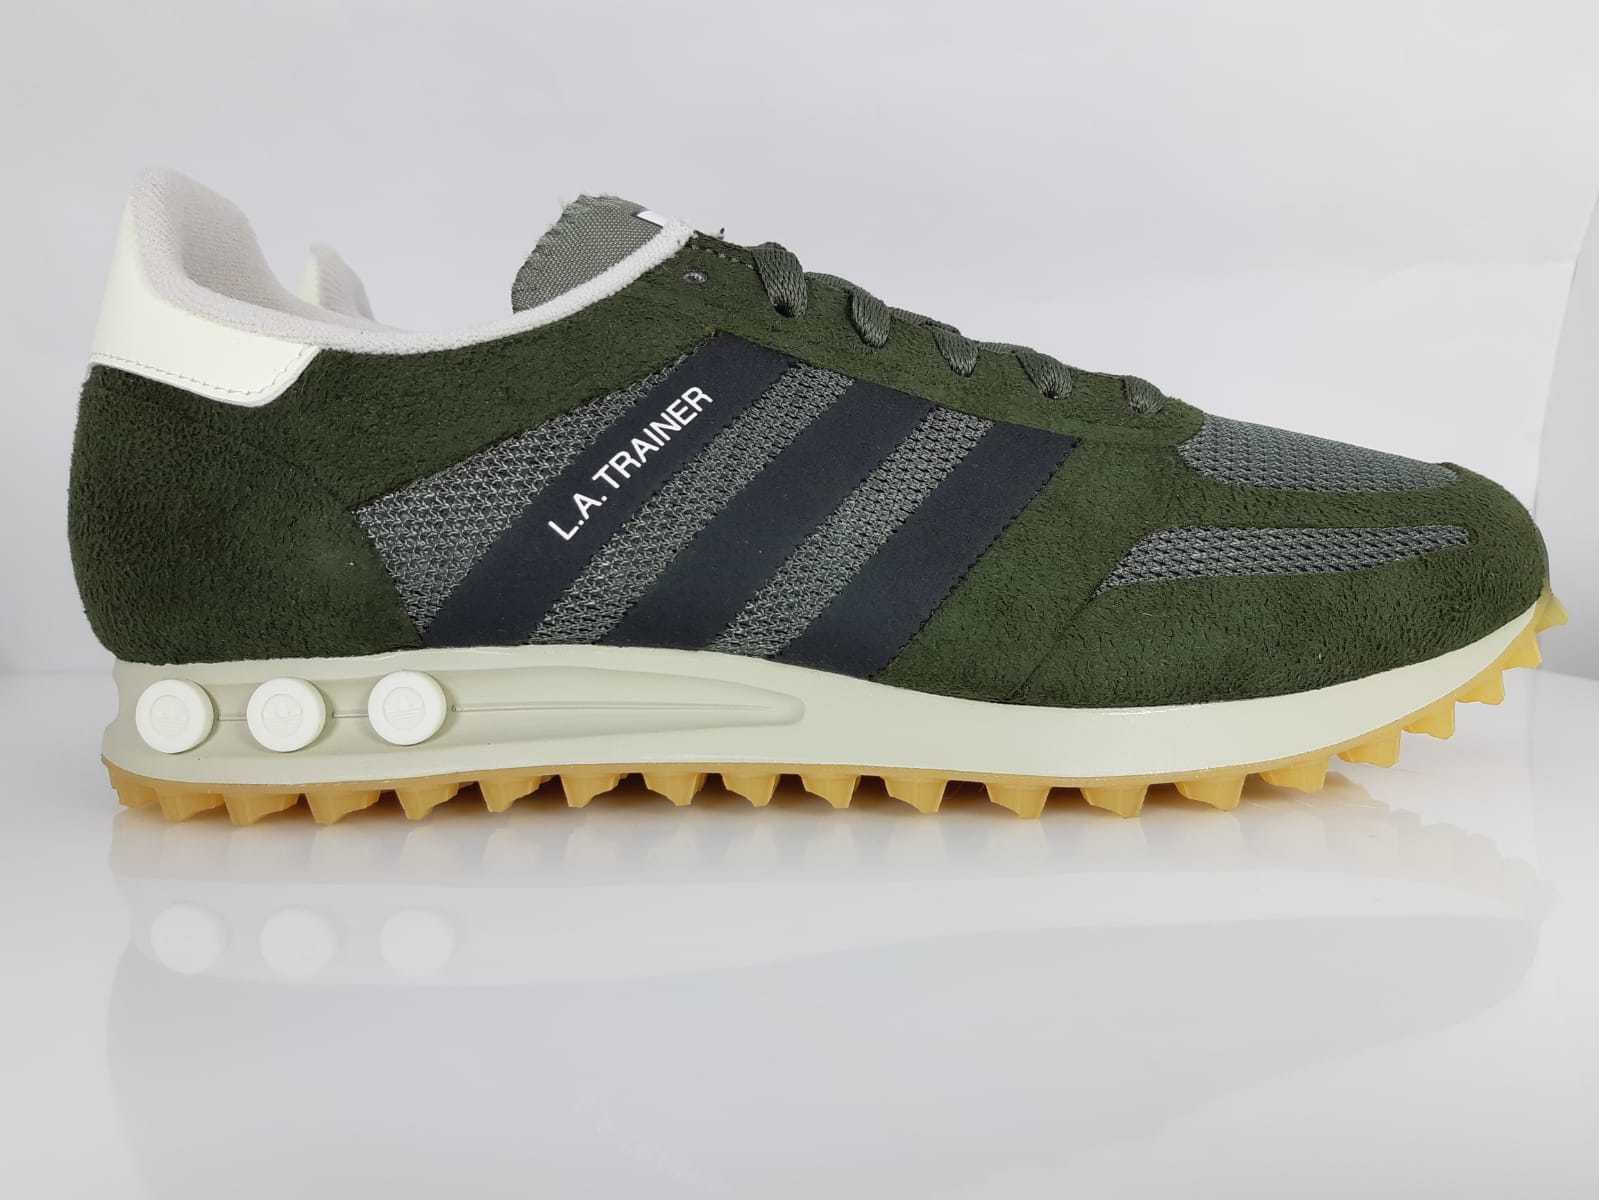 Adidas 24 Scarpe 13 La Trainer Cm 5rlj34a N39 Sneakers Artby9320 QrdCxtsh